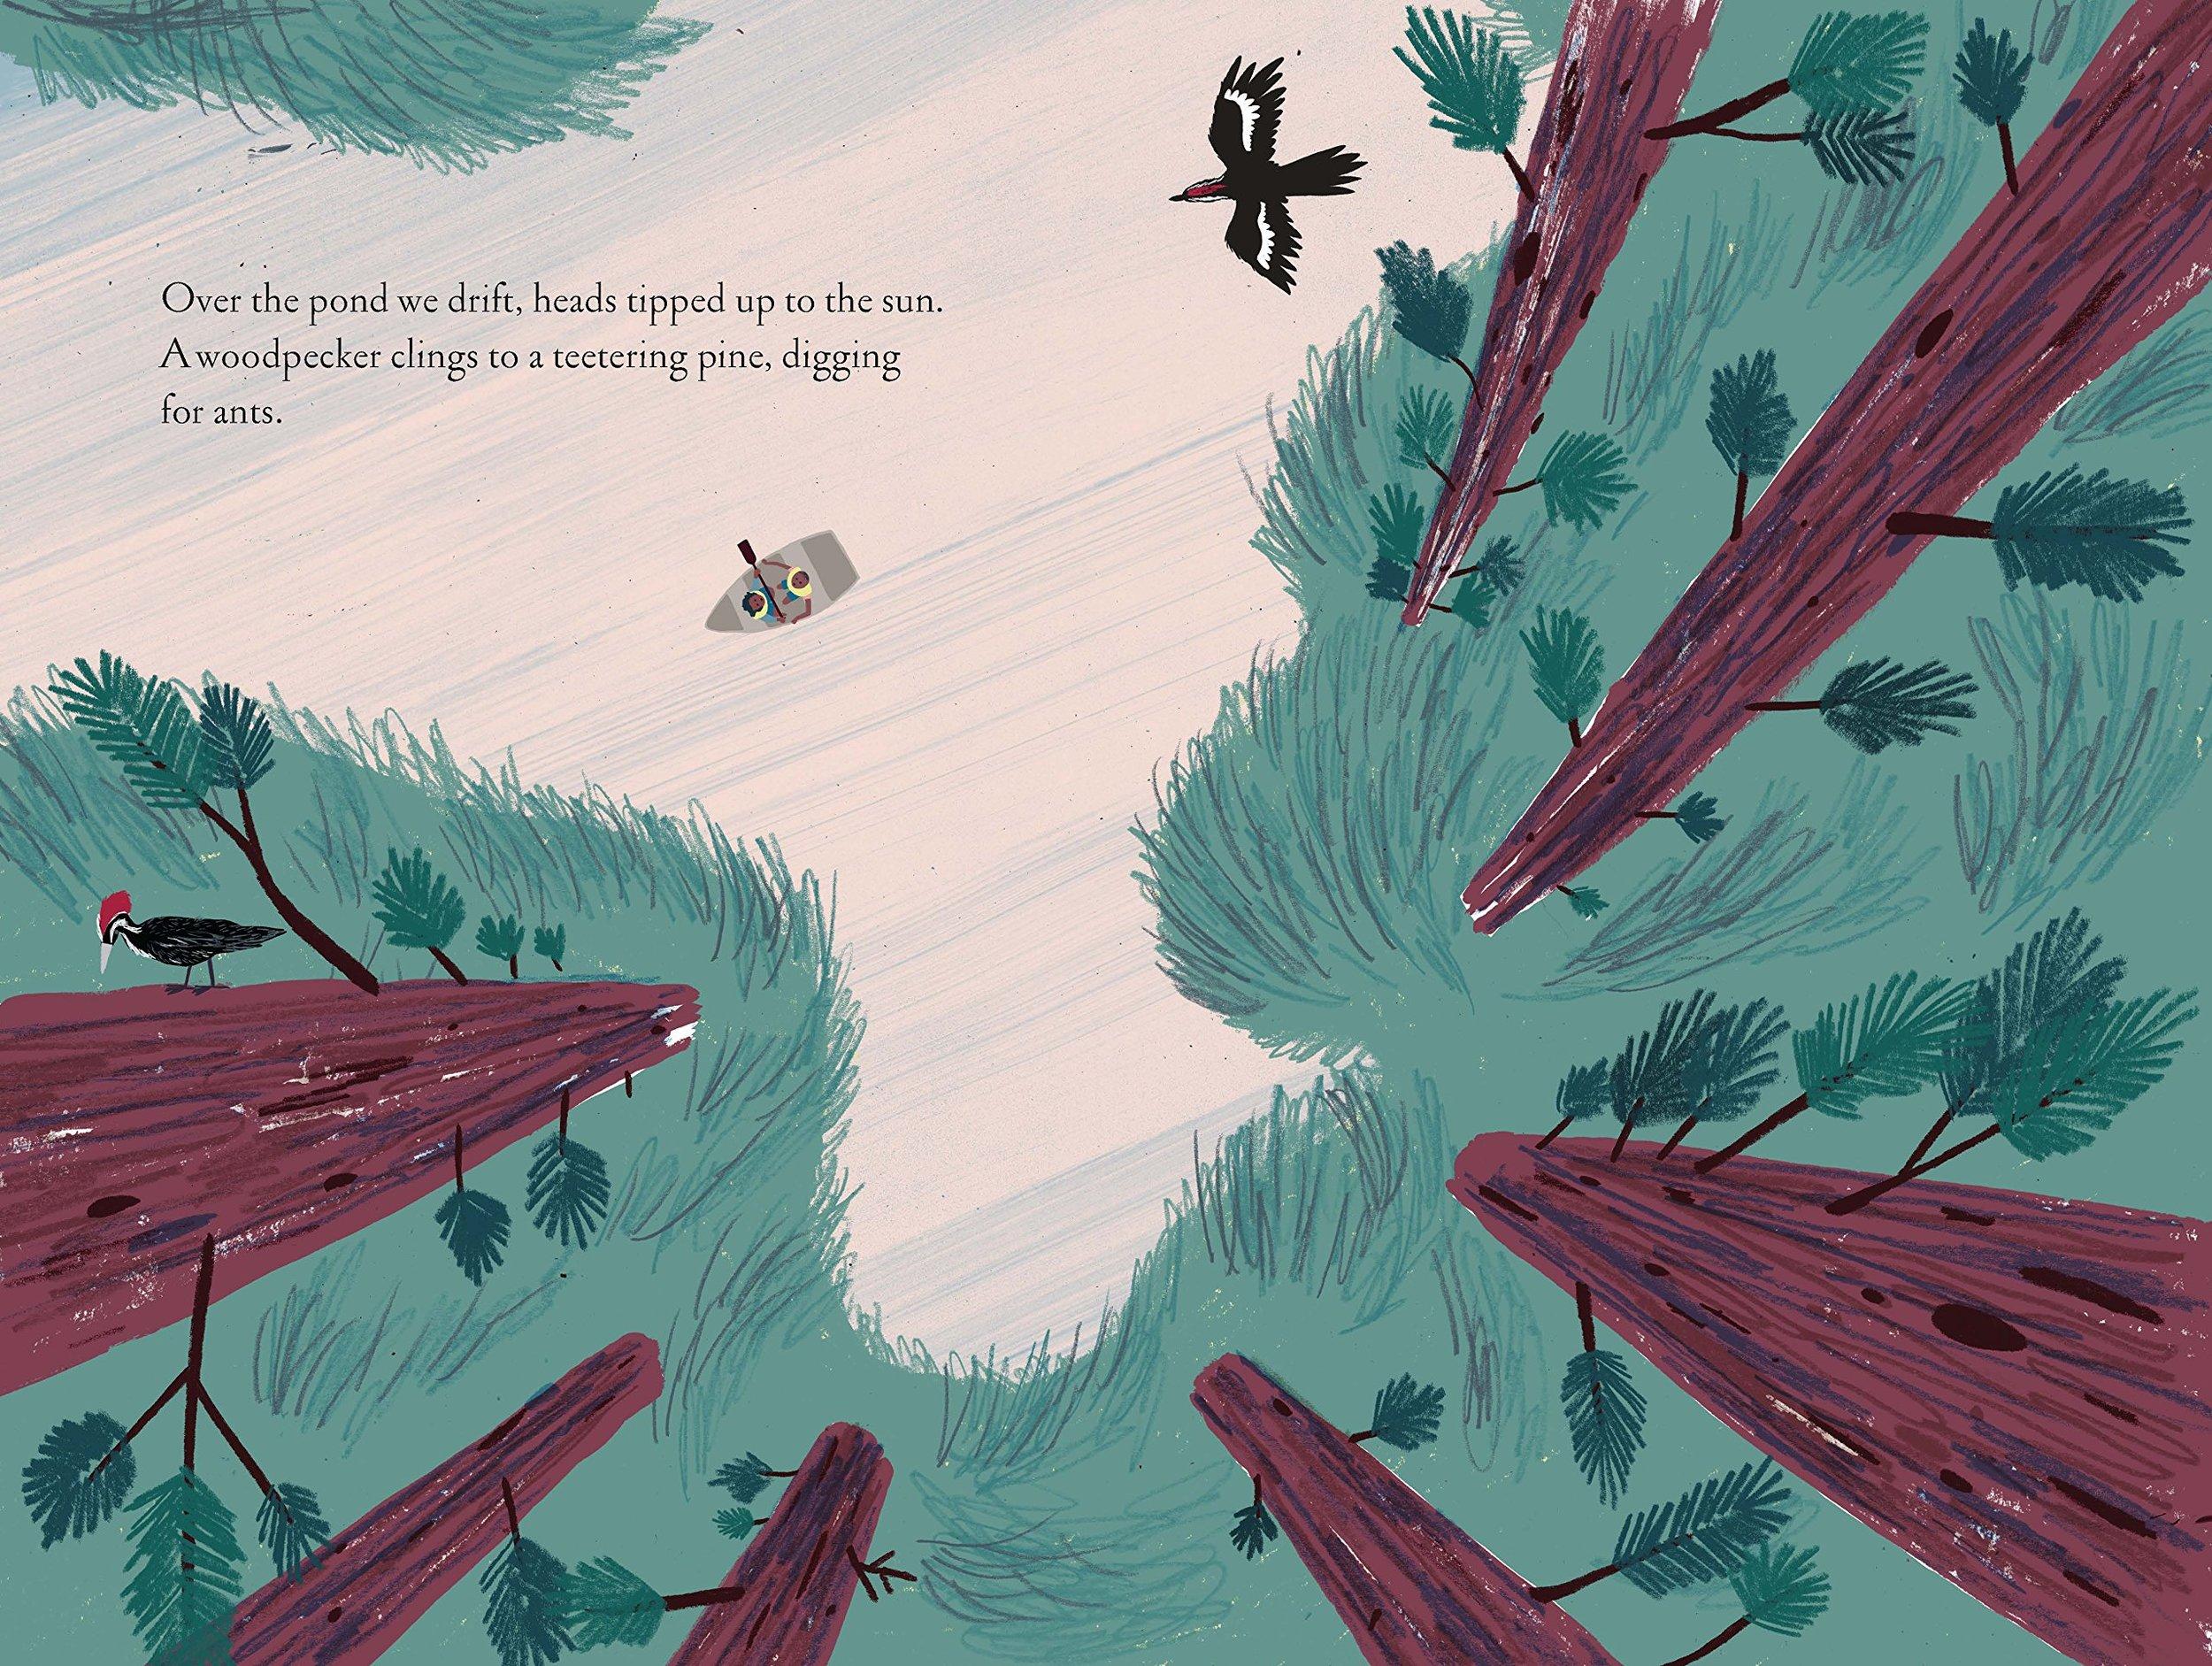 pond-woodpecker-overthepond.jpg